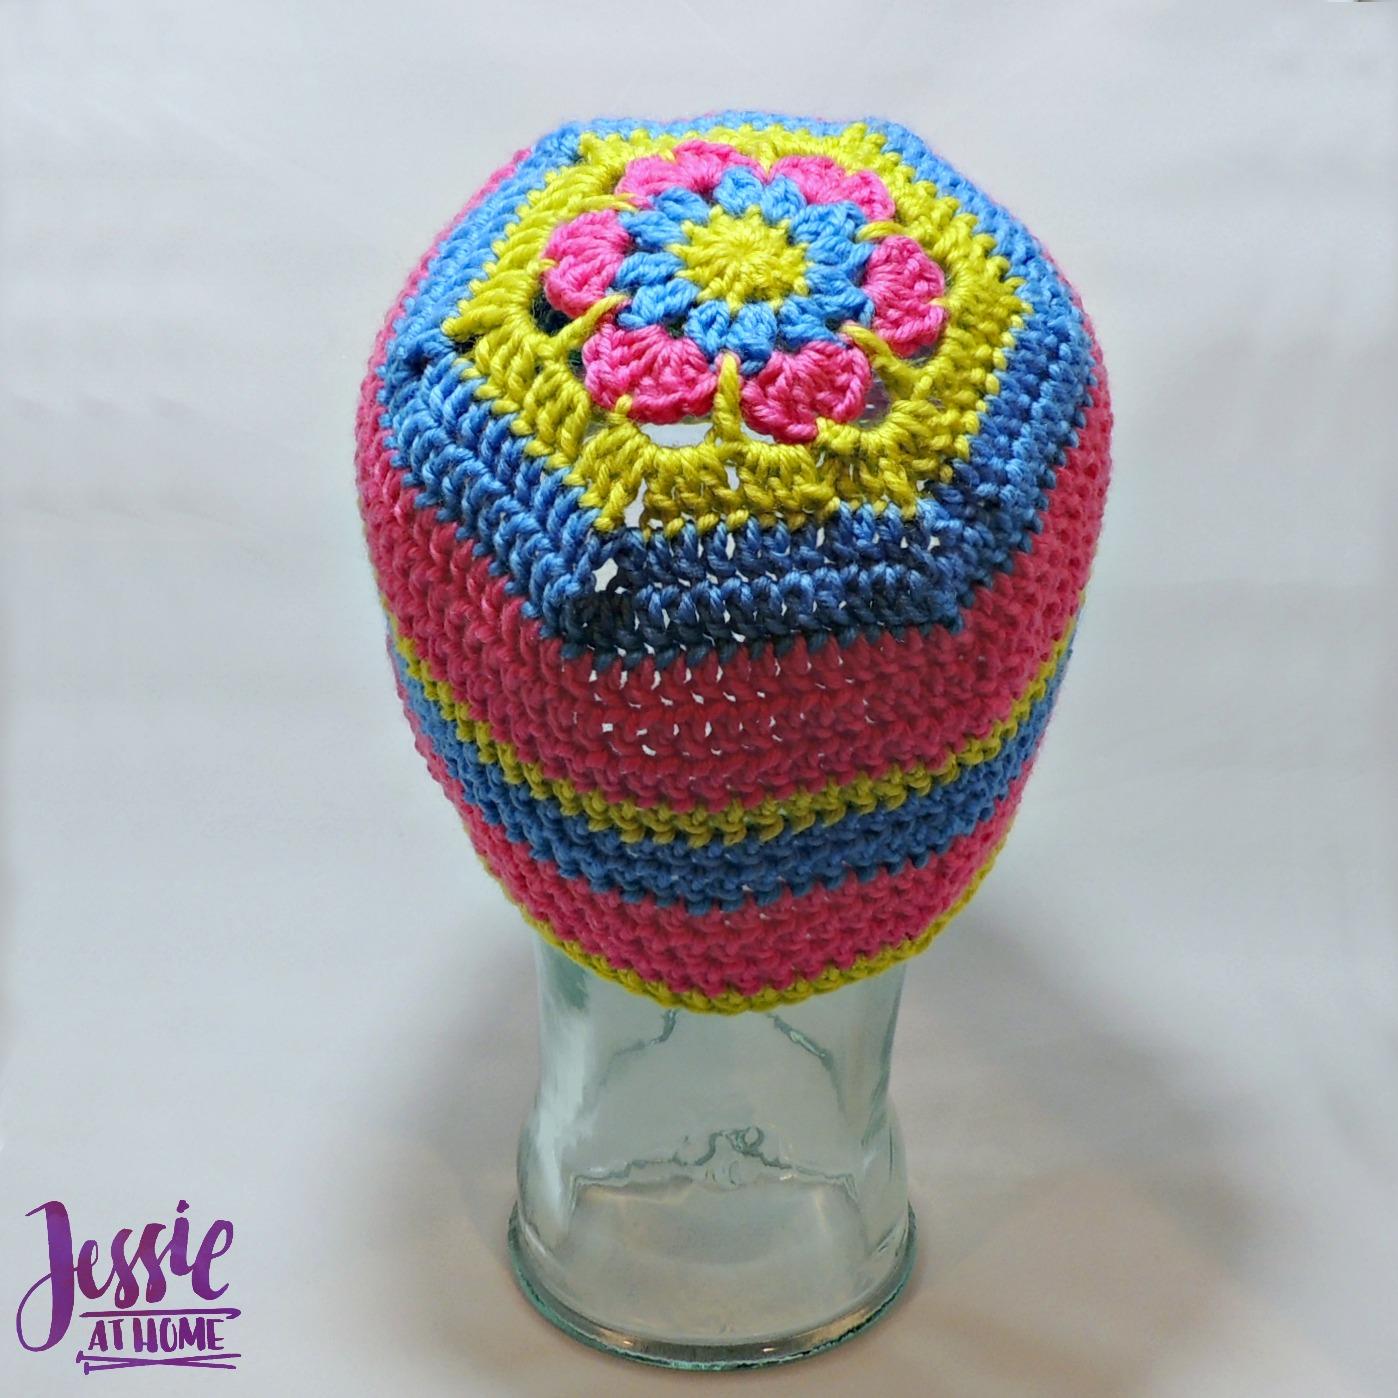 Flower Head Hat - free crochet pattern by Jessie At Home - 3